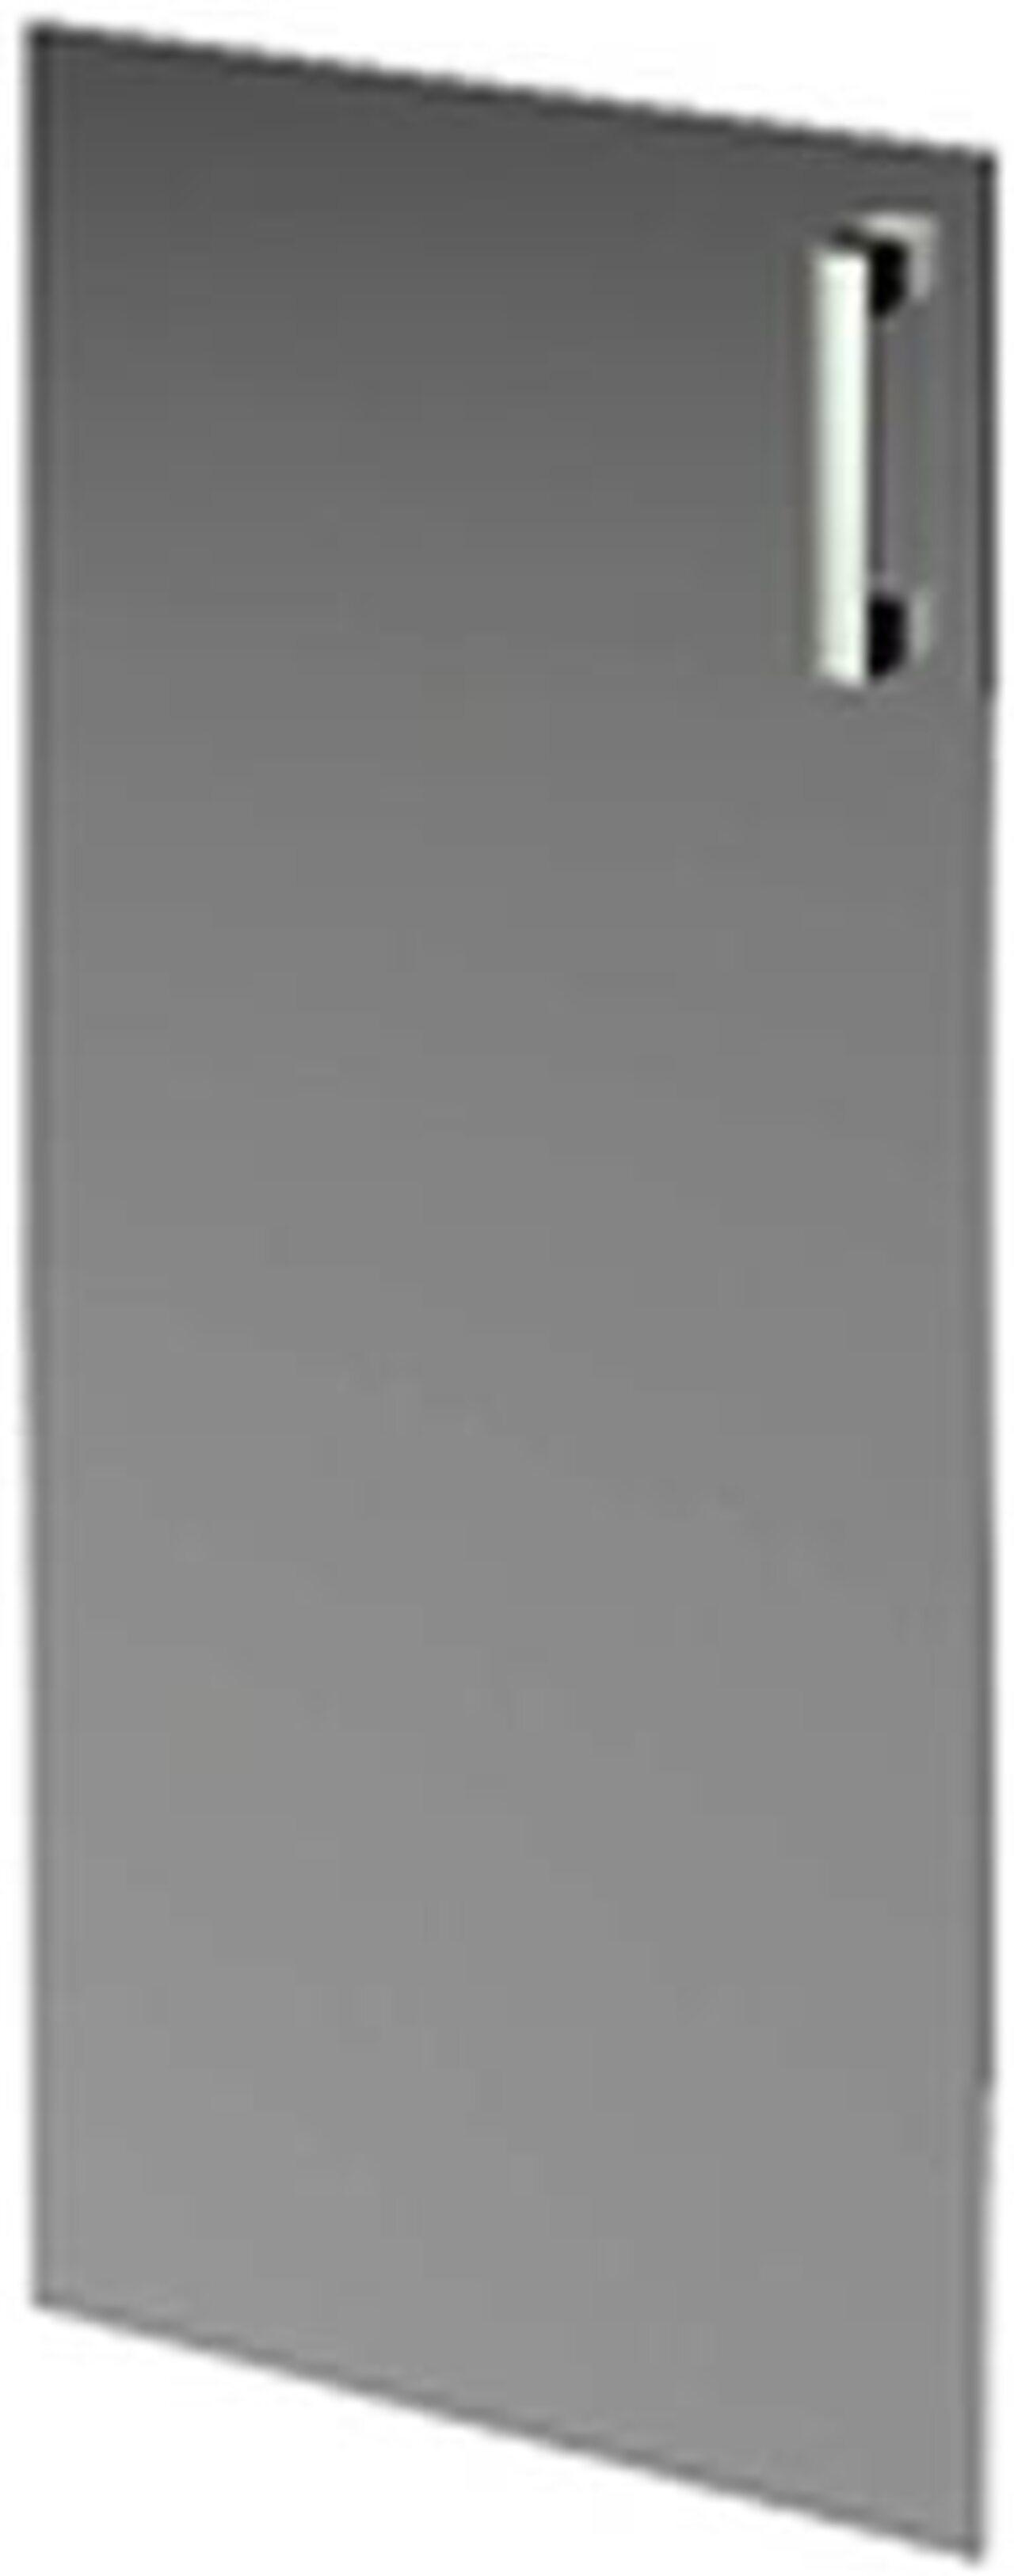 Дверь средняя стеклянная  Аргентум 39x1x118 - фото 6